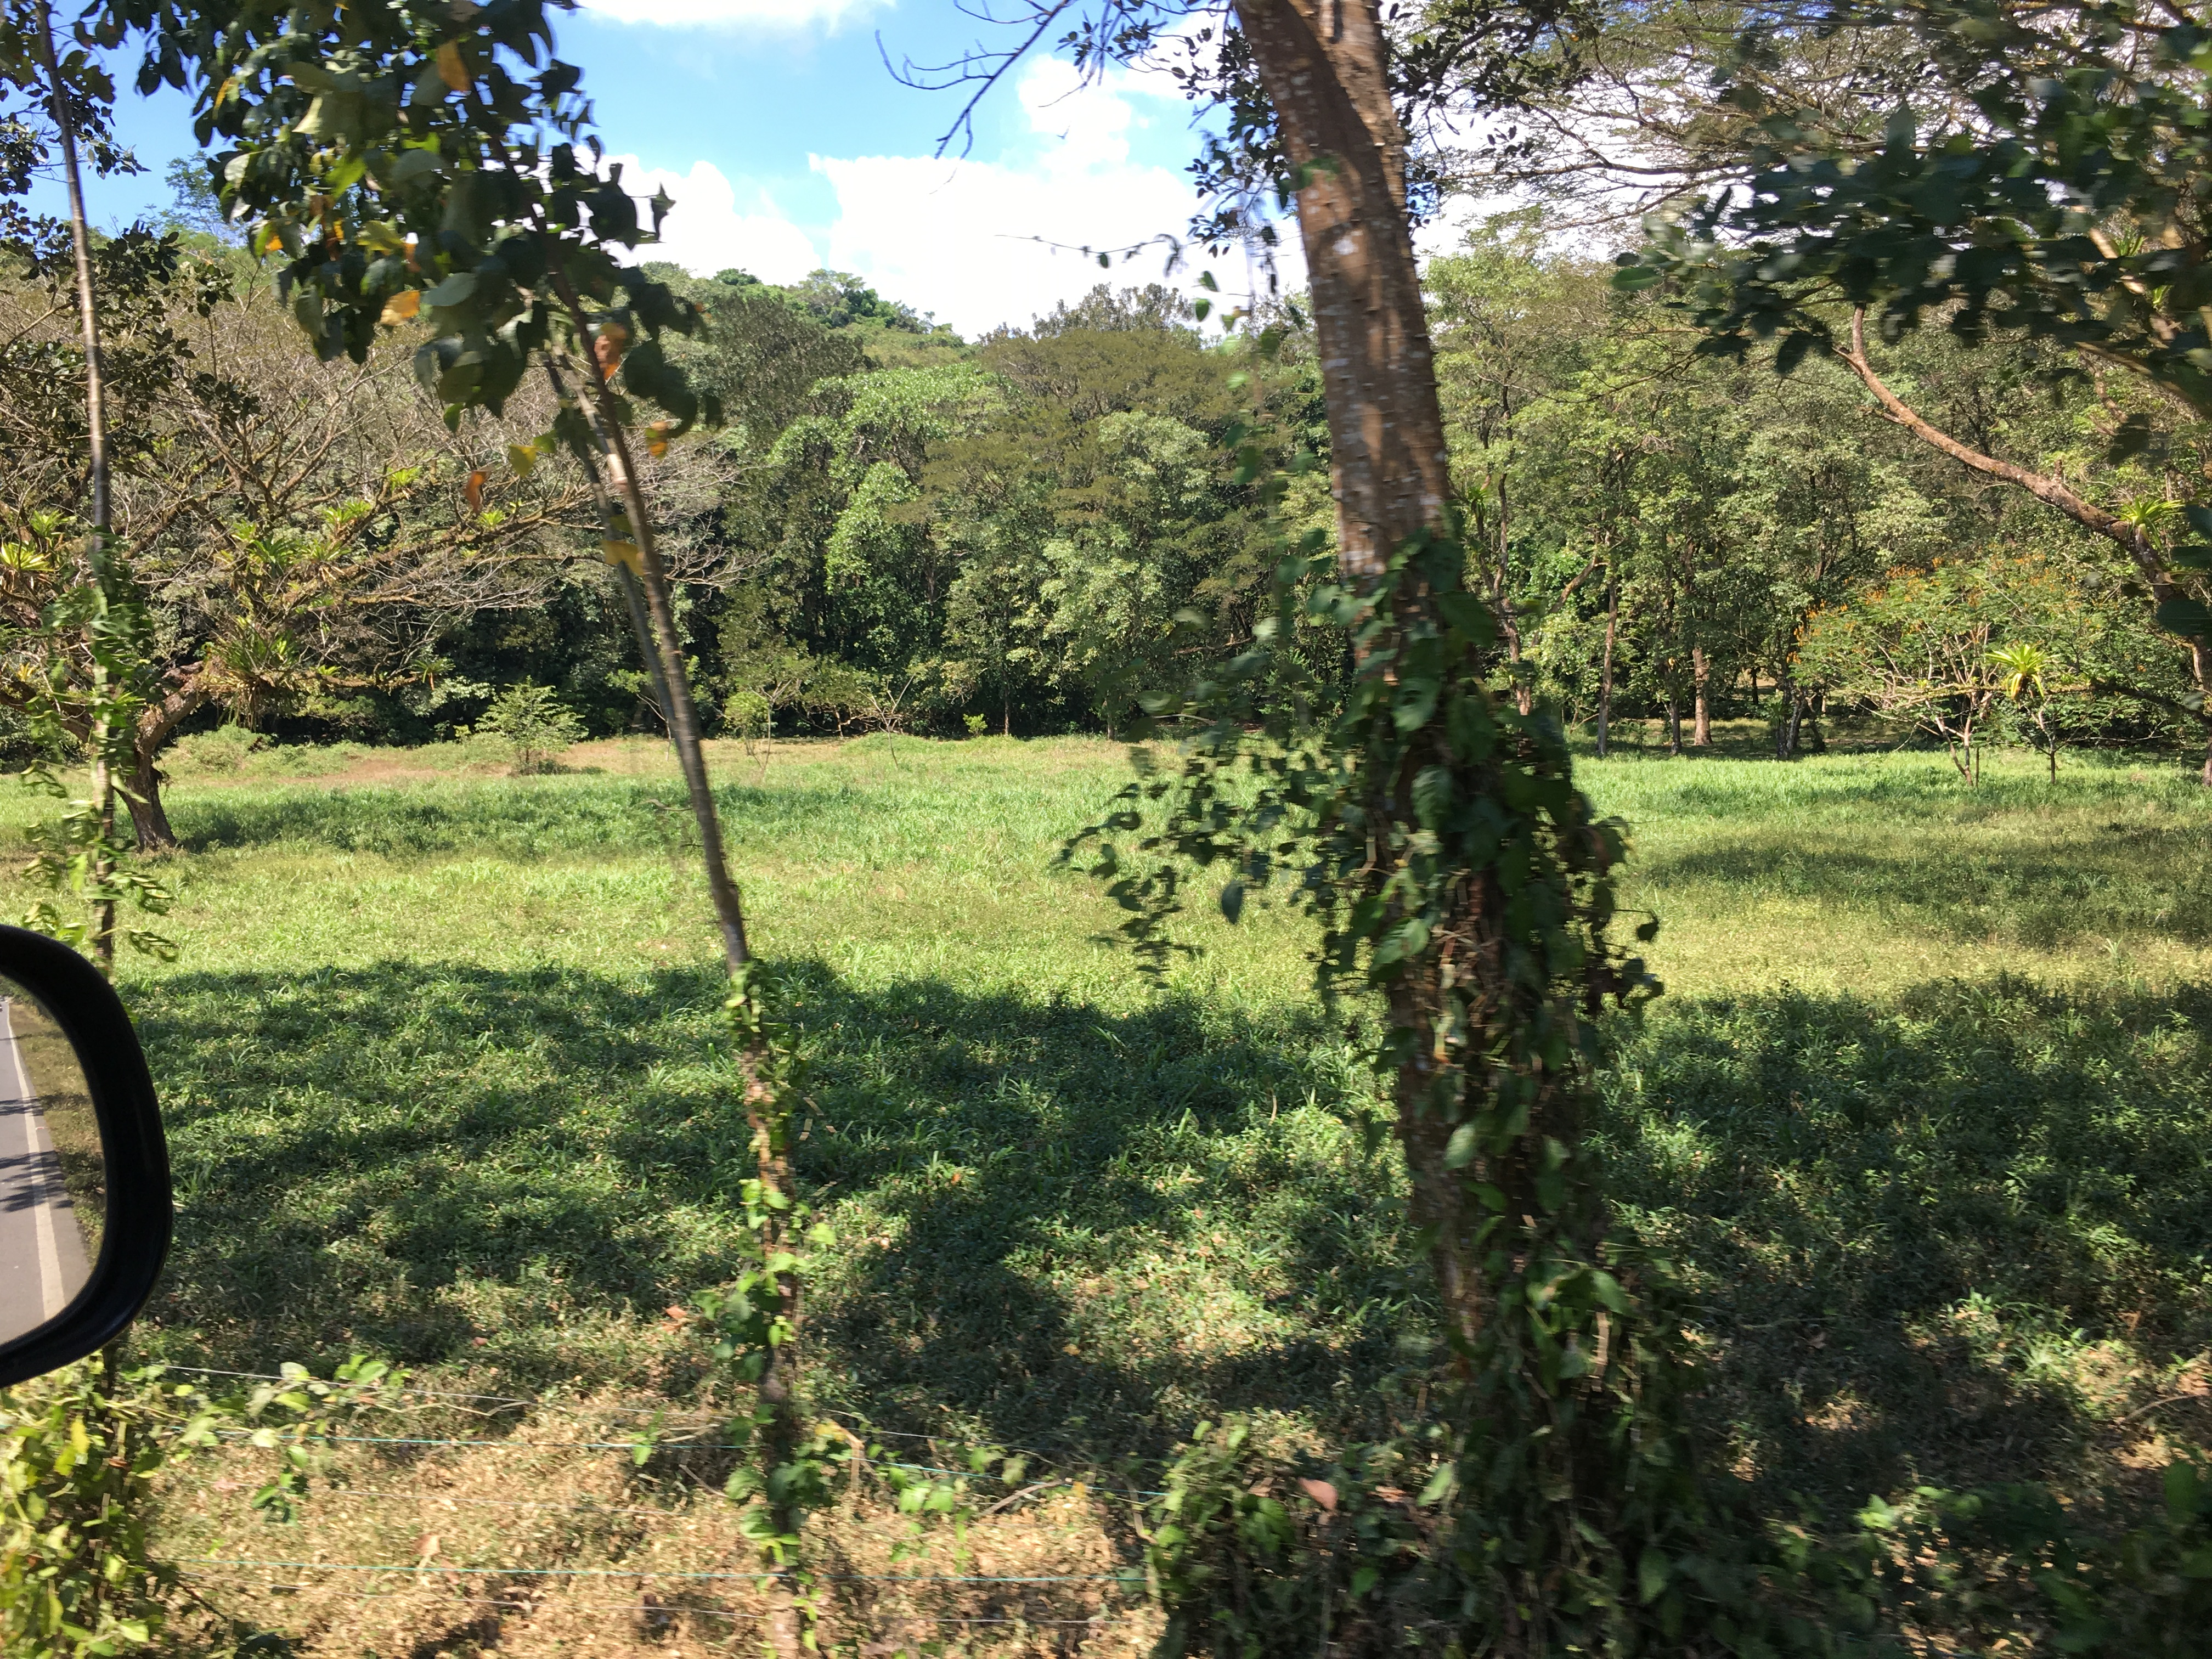 Dominical-Costa-Rica-property-costaricarealestateDOM331-7.jpg